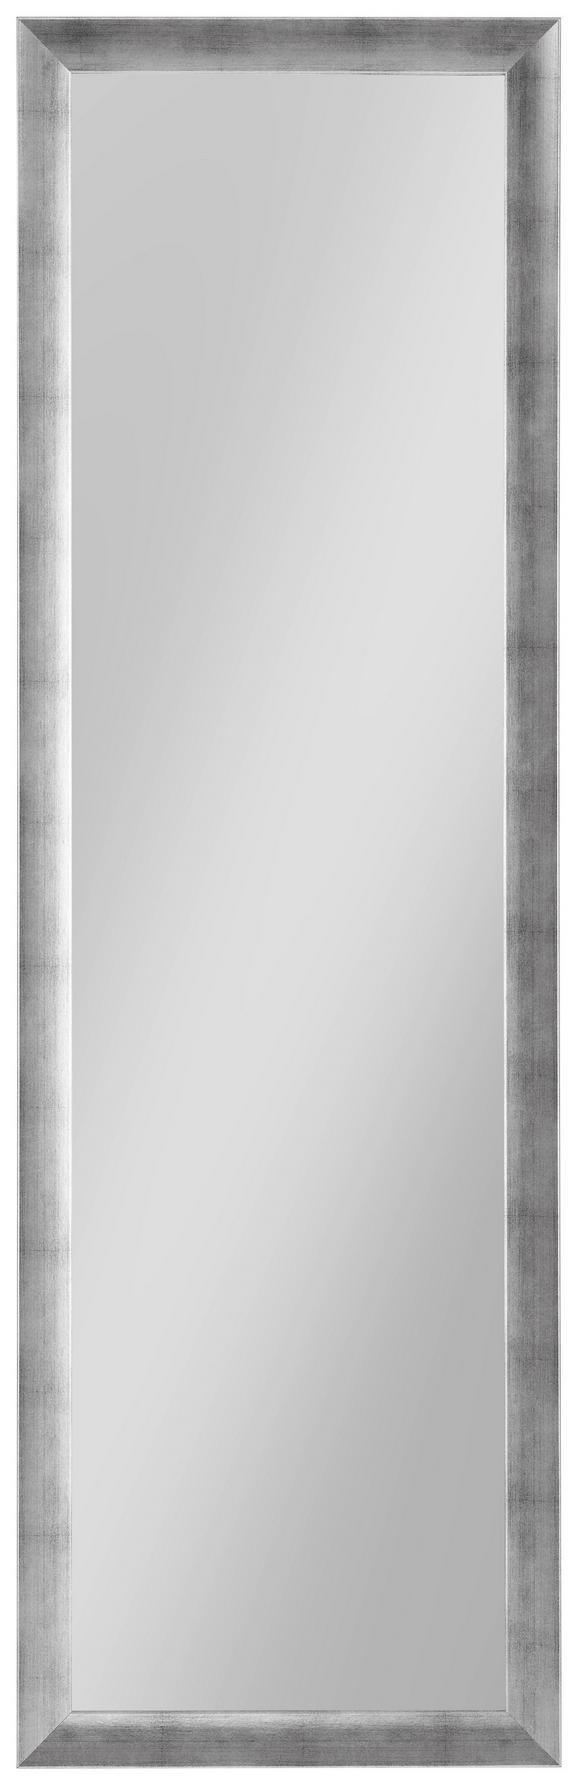 Wandspiegel in Silber ca. 50x160cm - Silberfarben, MODERN, Glas/Holzwerkstoff (50/160cm) - Mömax modern living